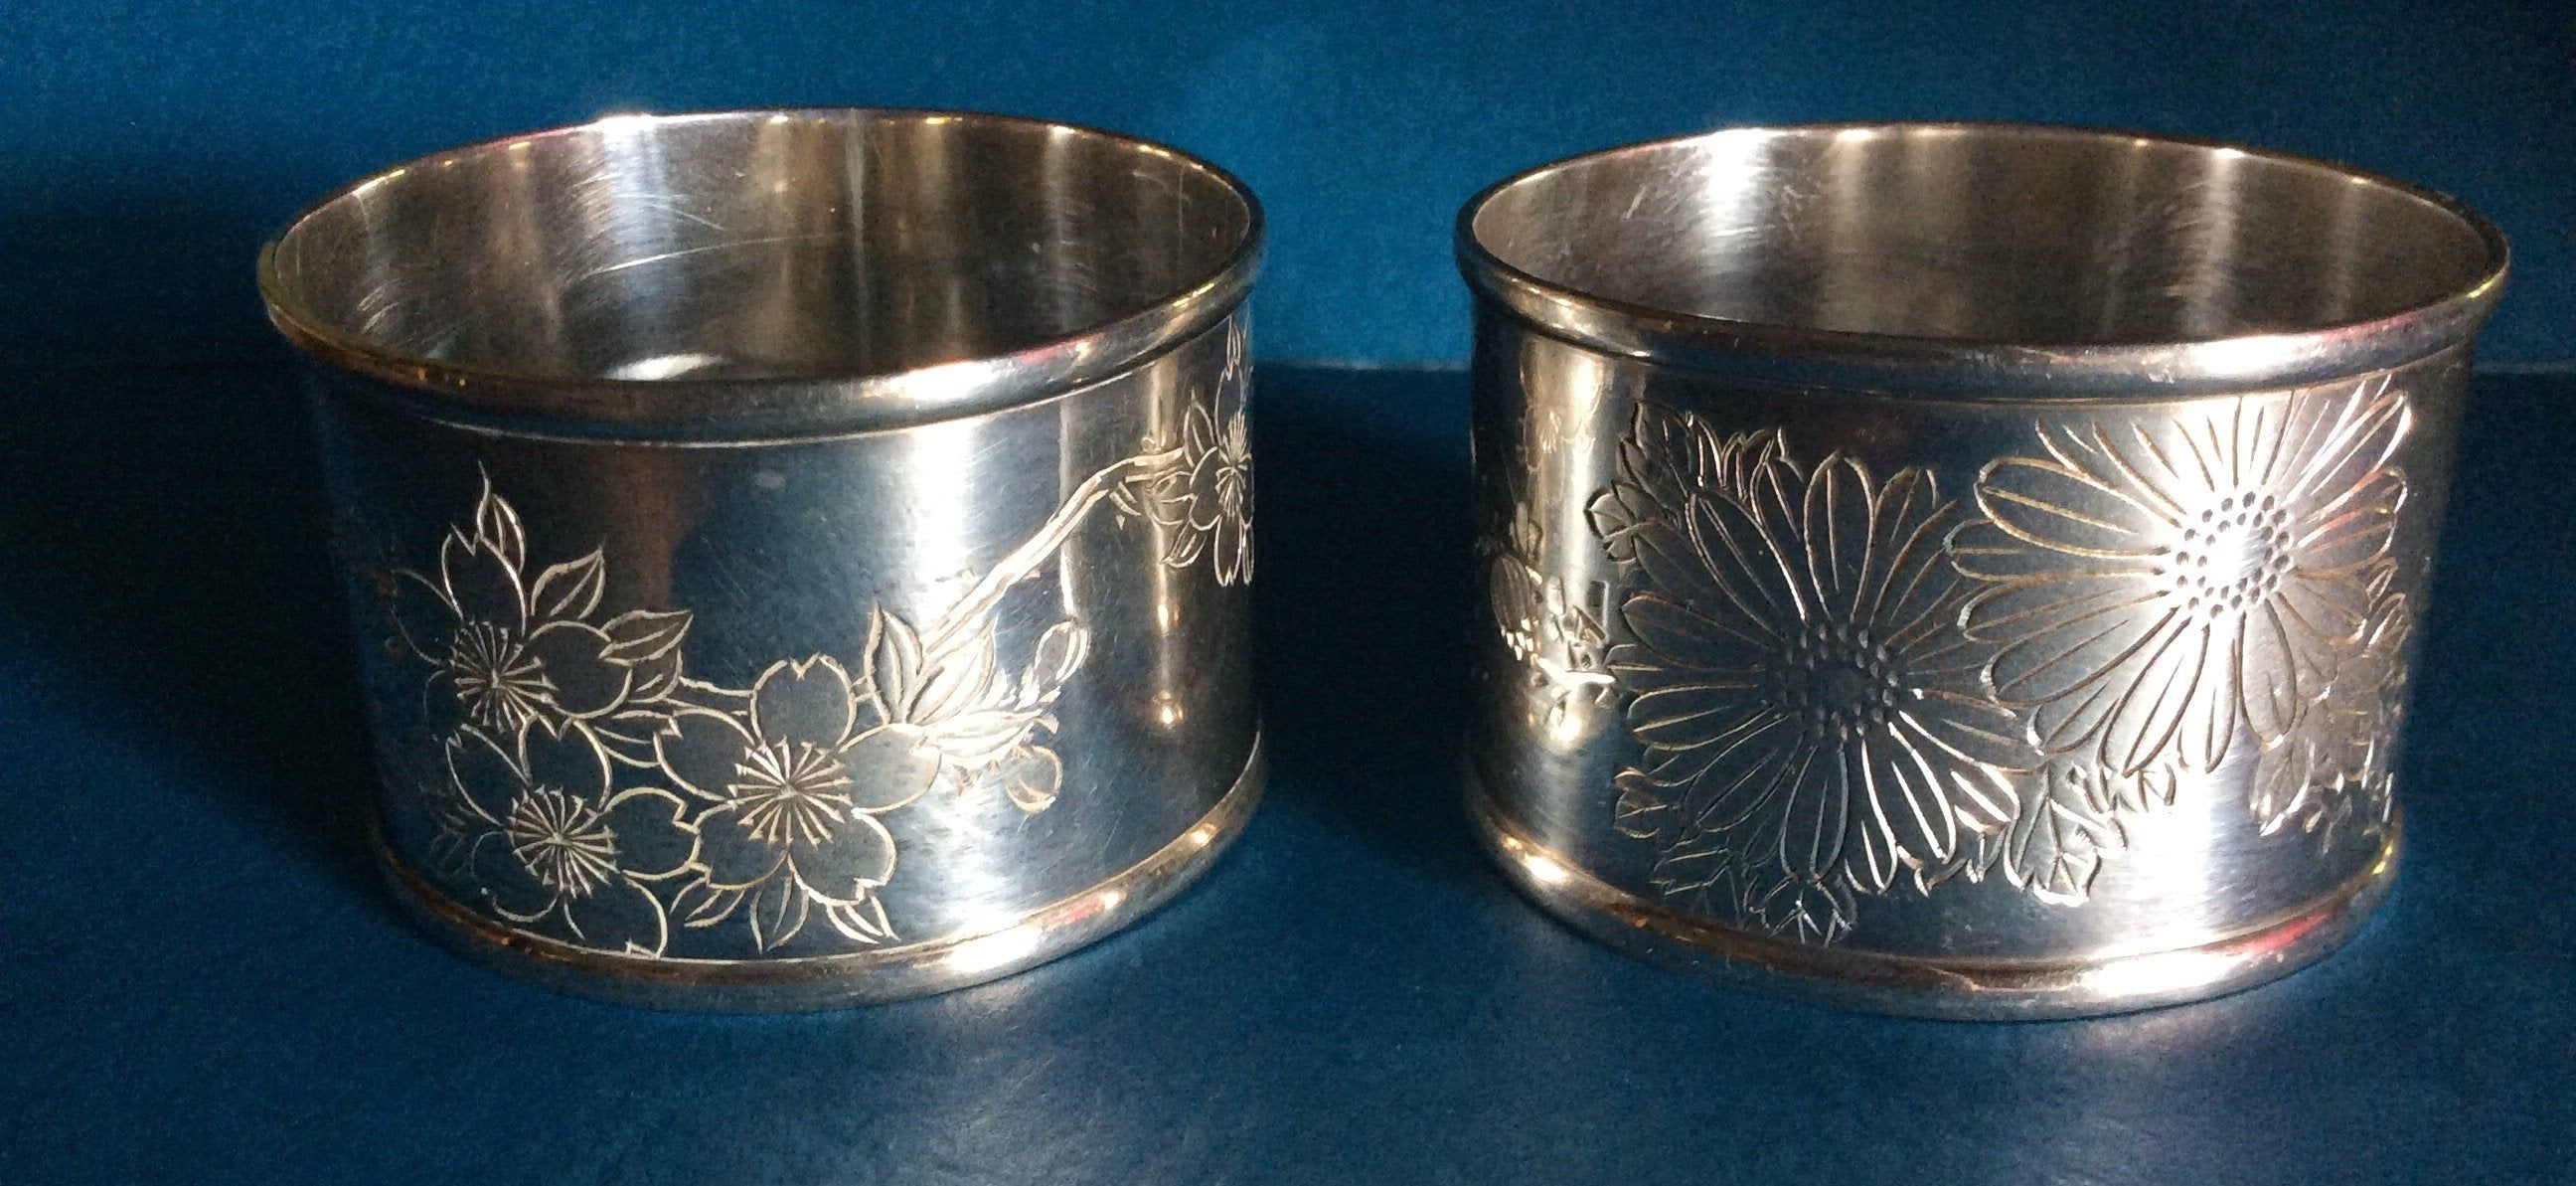 2 X silver napkin rings